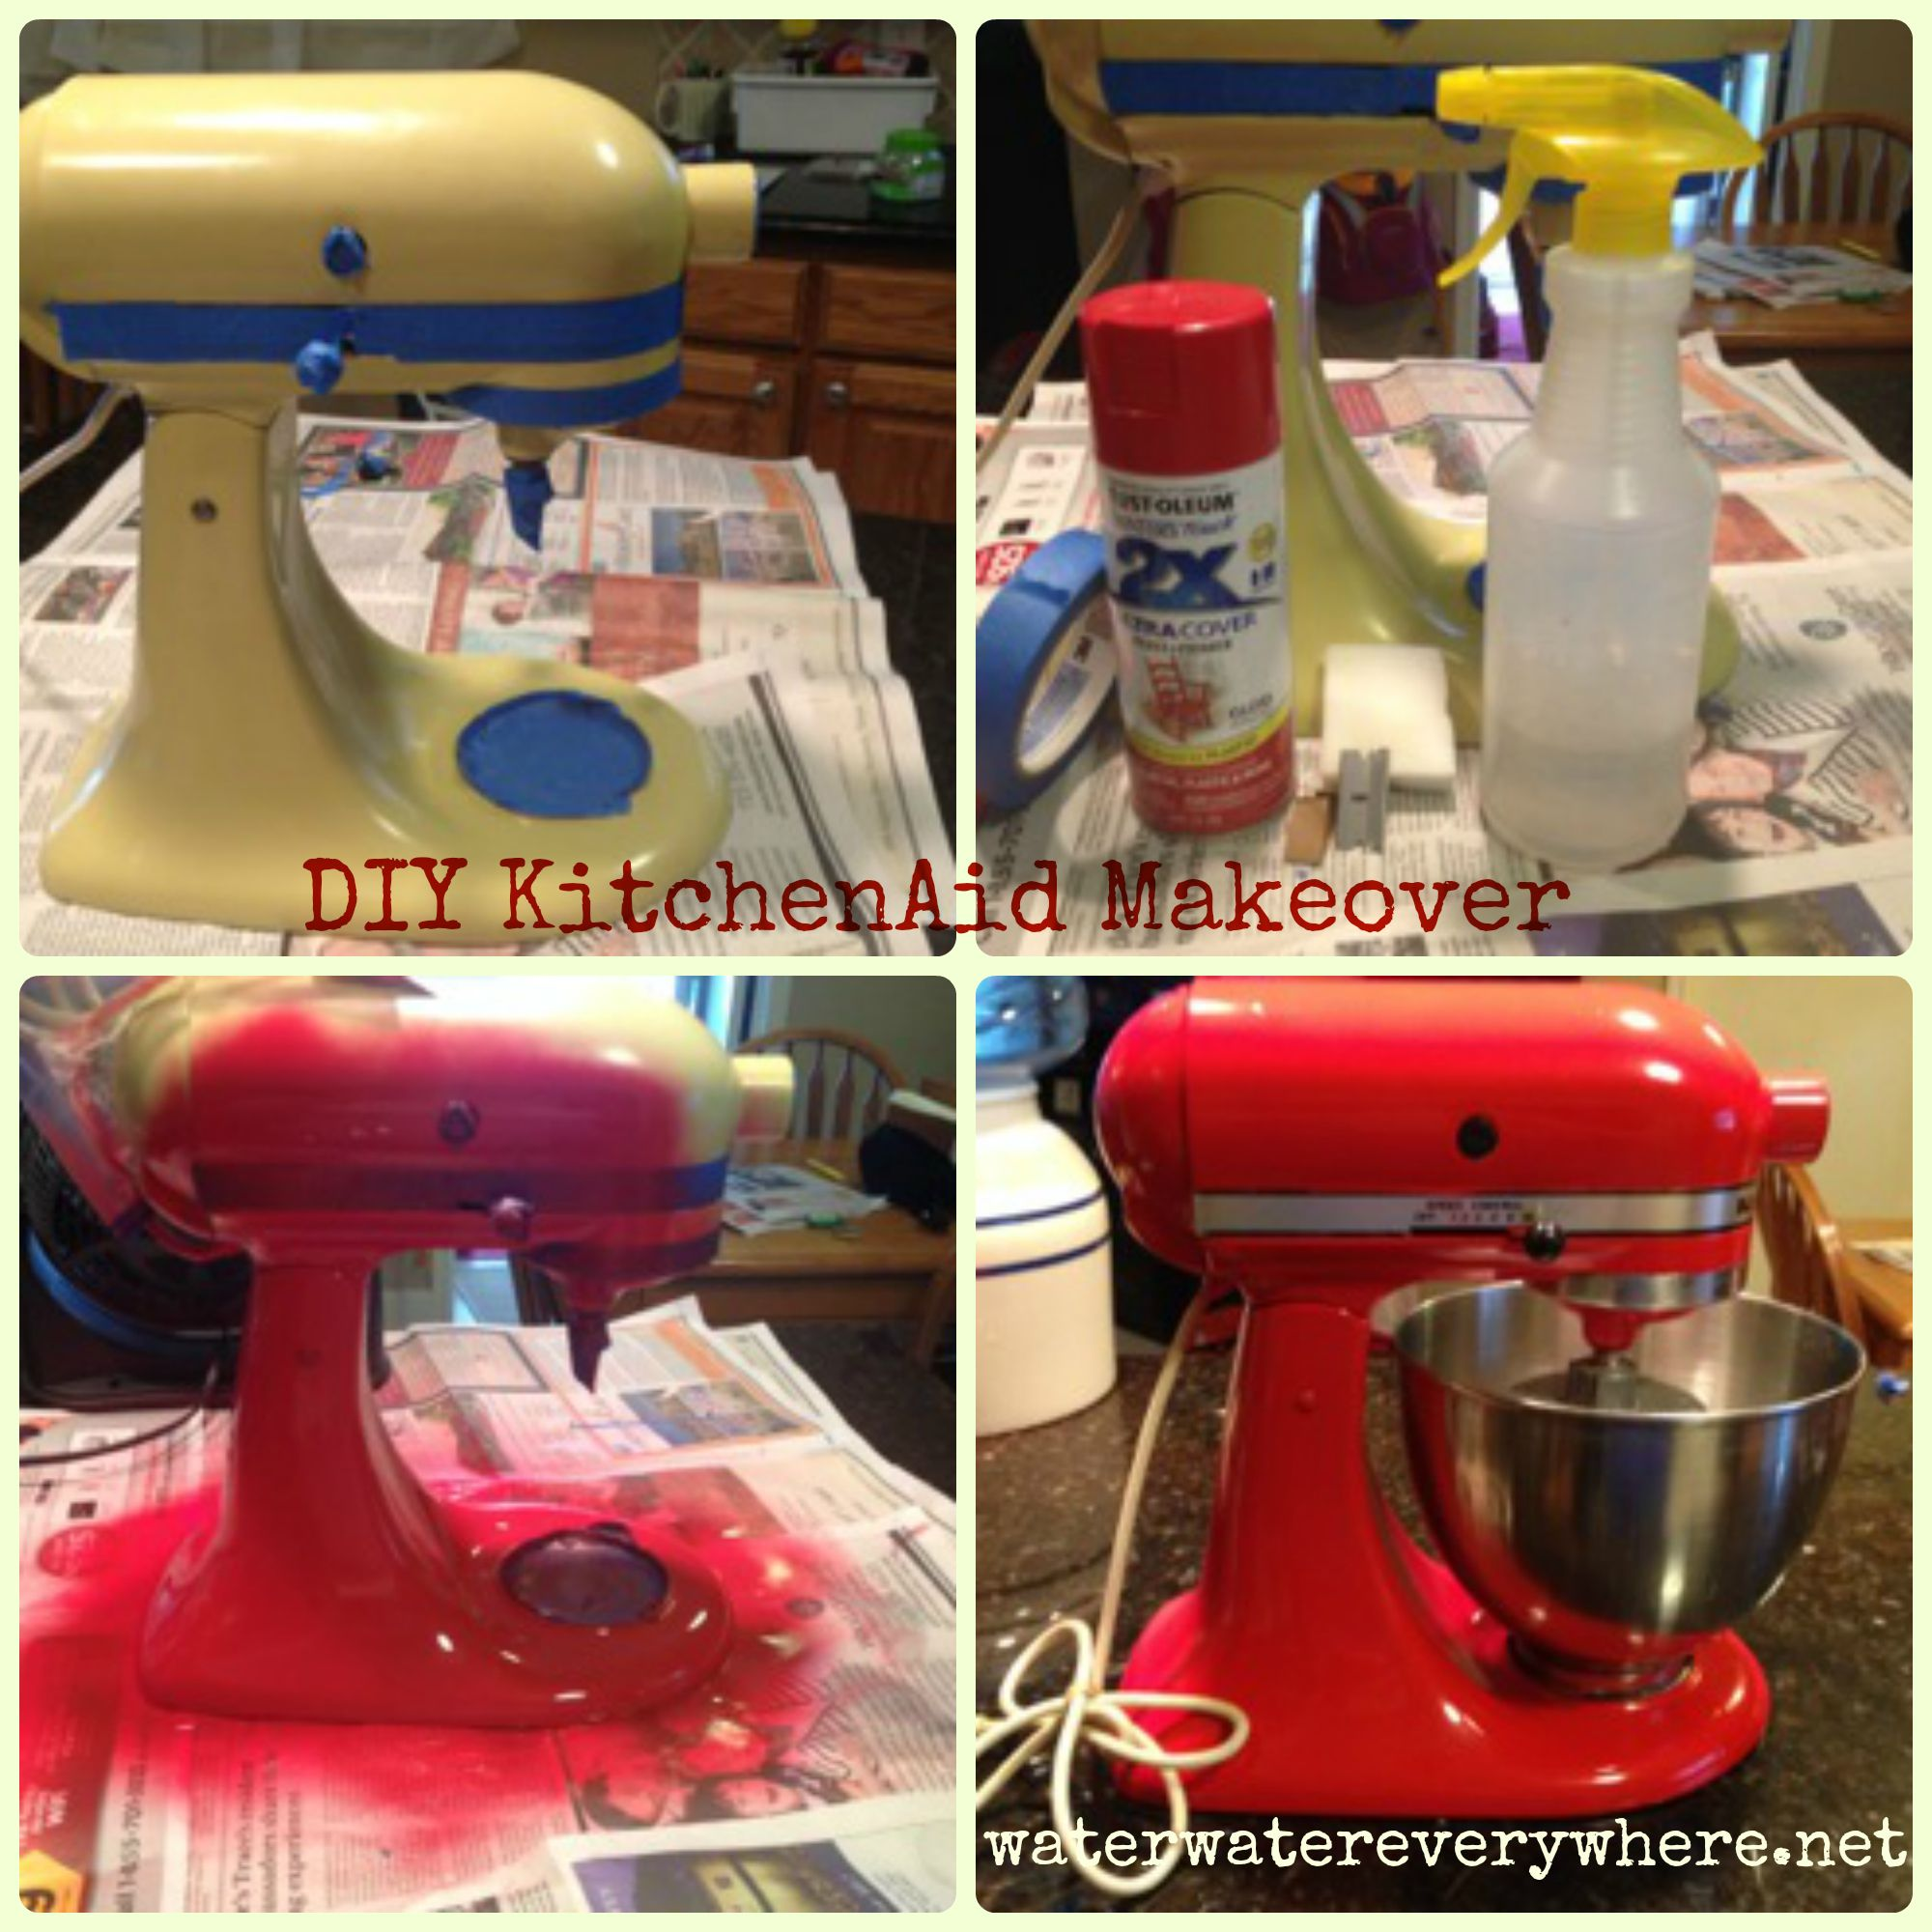 Diy vintage kitchenaid mixer makeover kitchen aid mixer